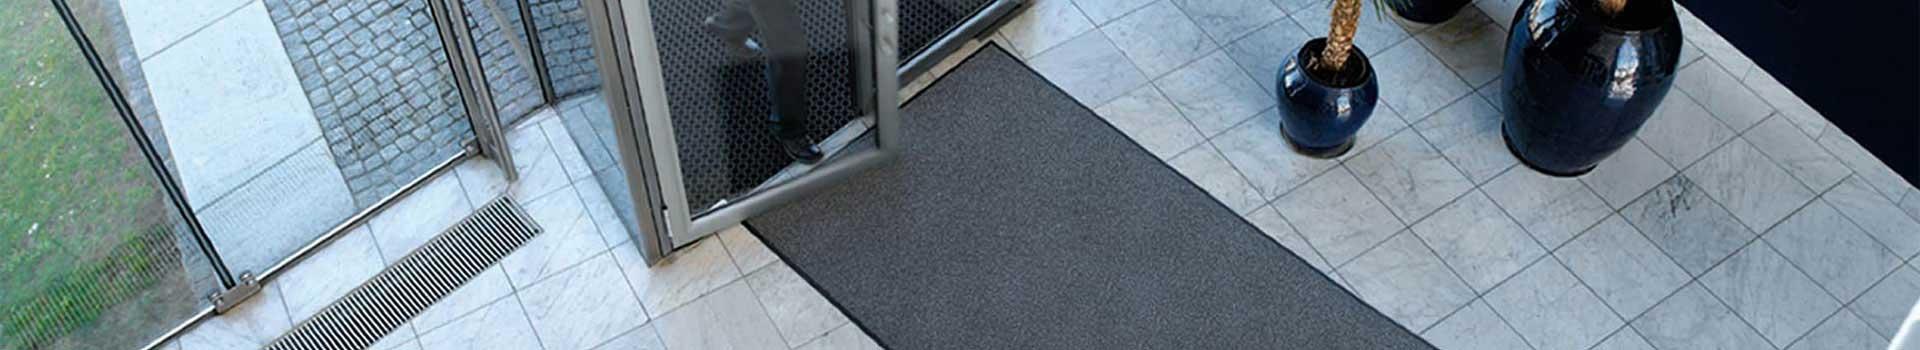 Commercial Serviced Floor Mats